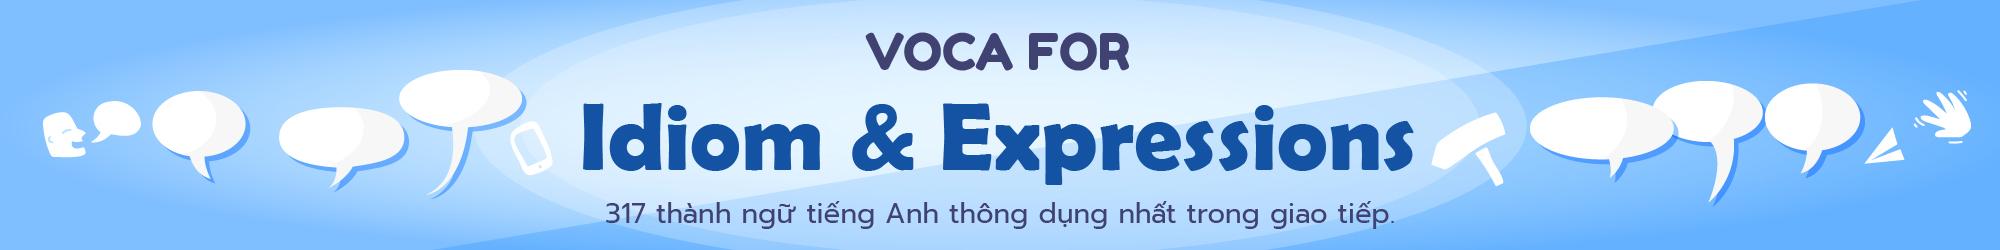 VOCA For IDIOMS & EXPRESSIONS